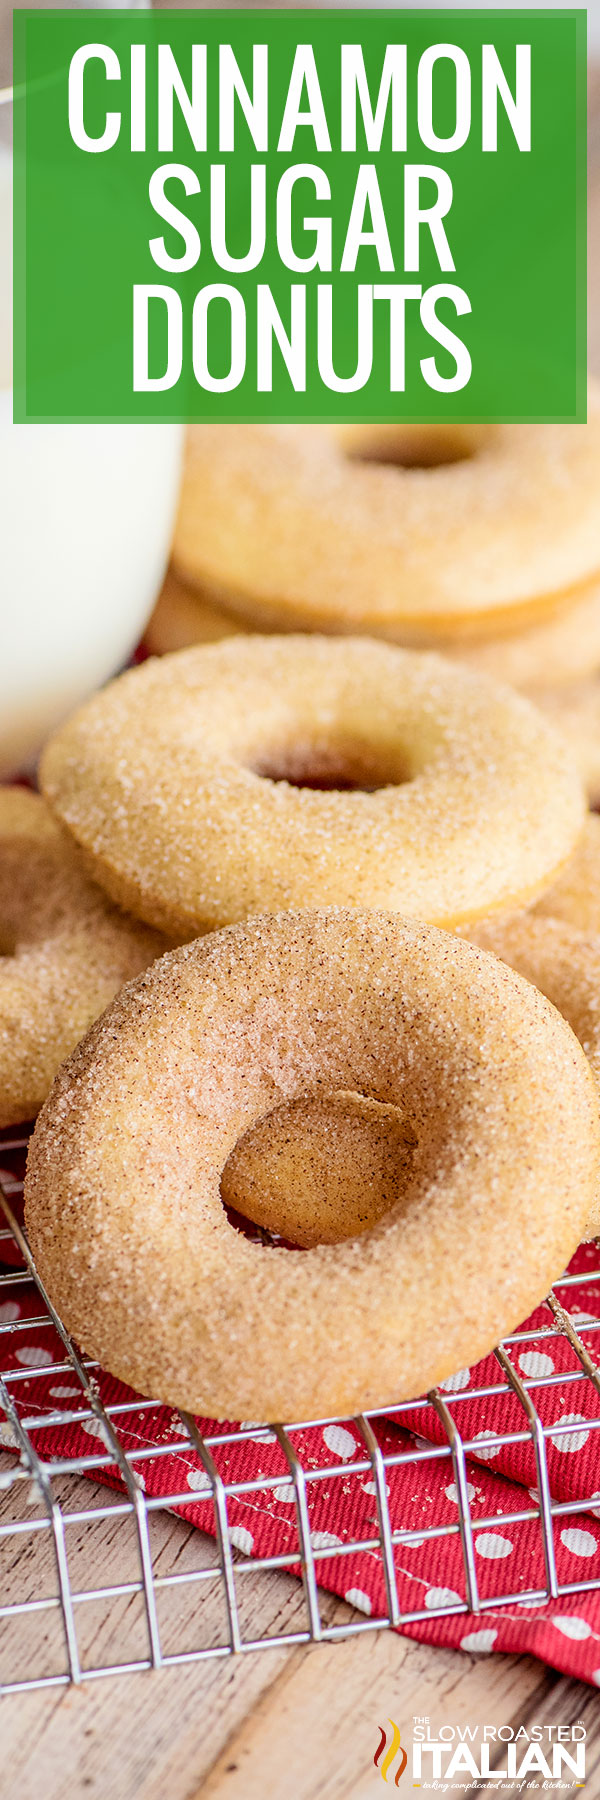 cinnamon sugar donuts closeup